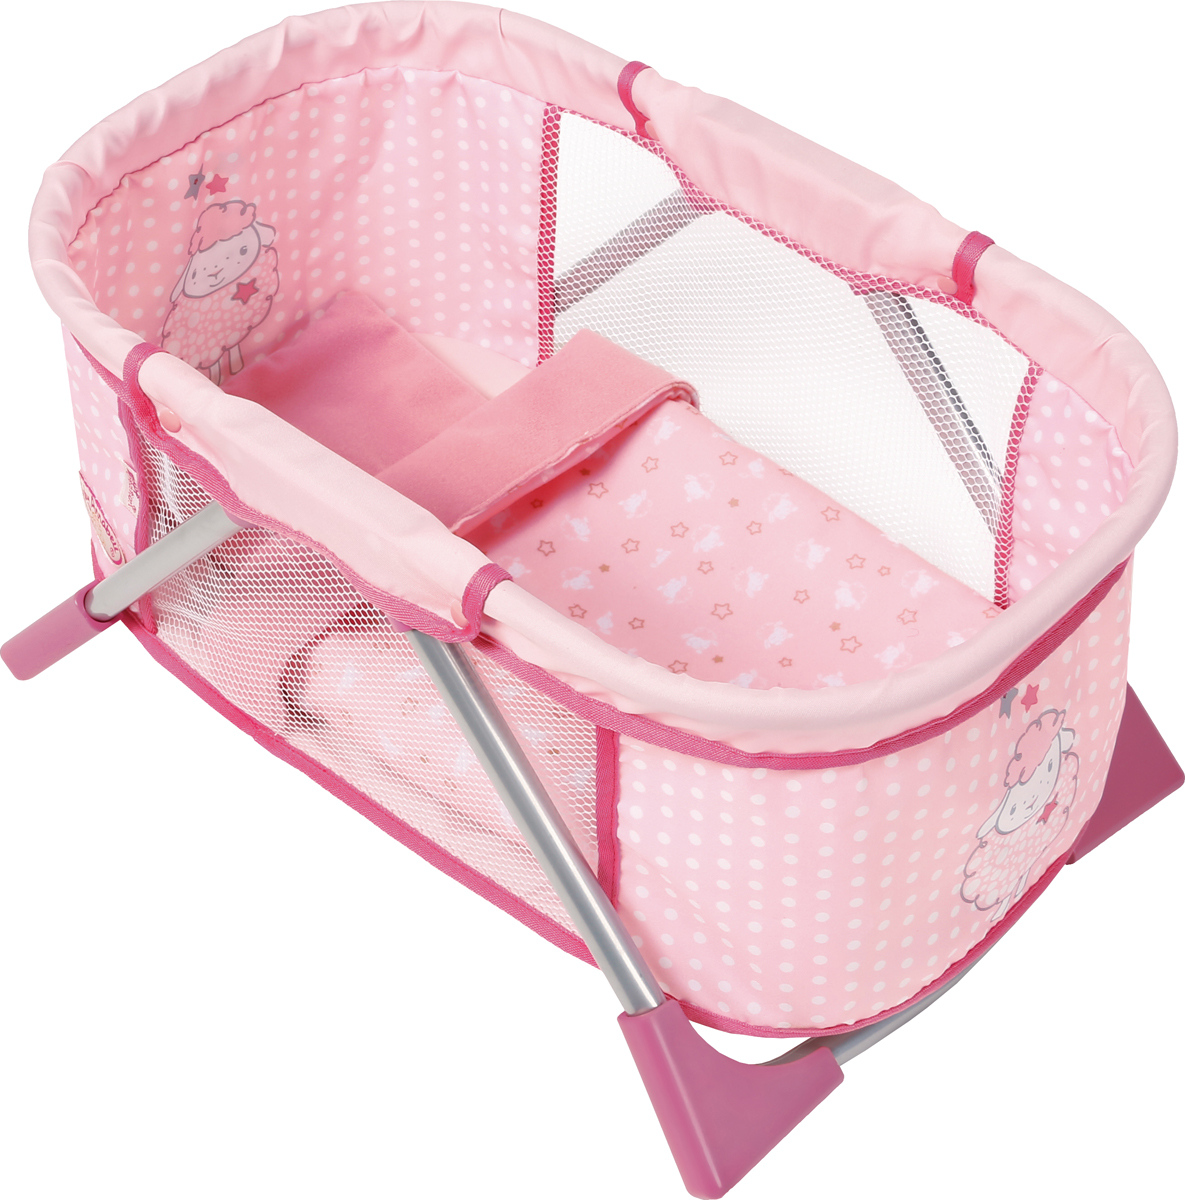 Zapf Creation Кроватка для куклы Baby Annabell игрушка baby annabell кроватка спокойной ночи кор